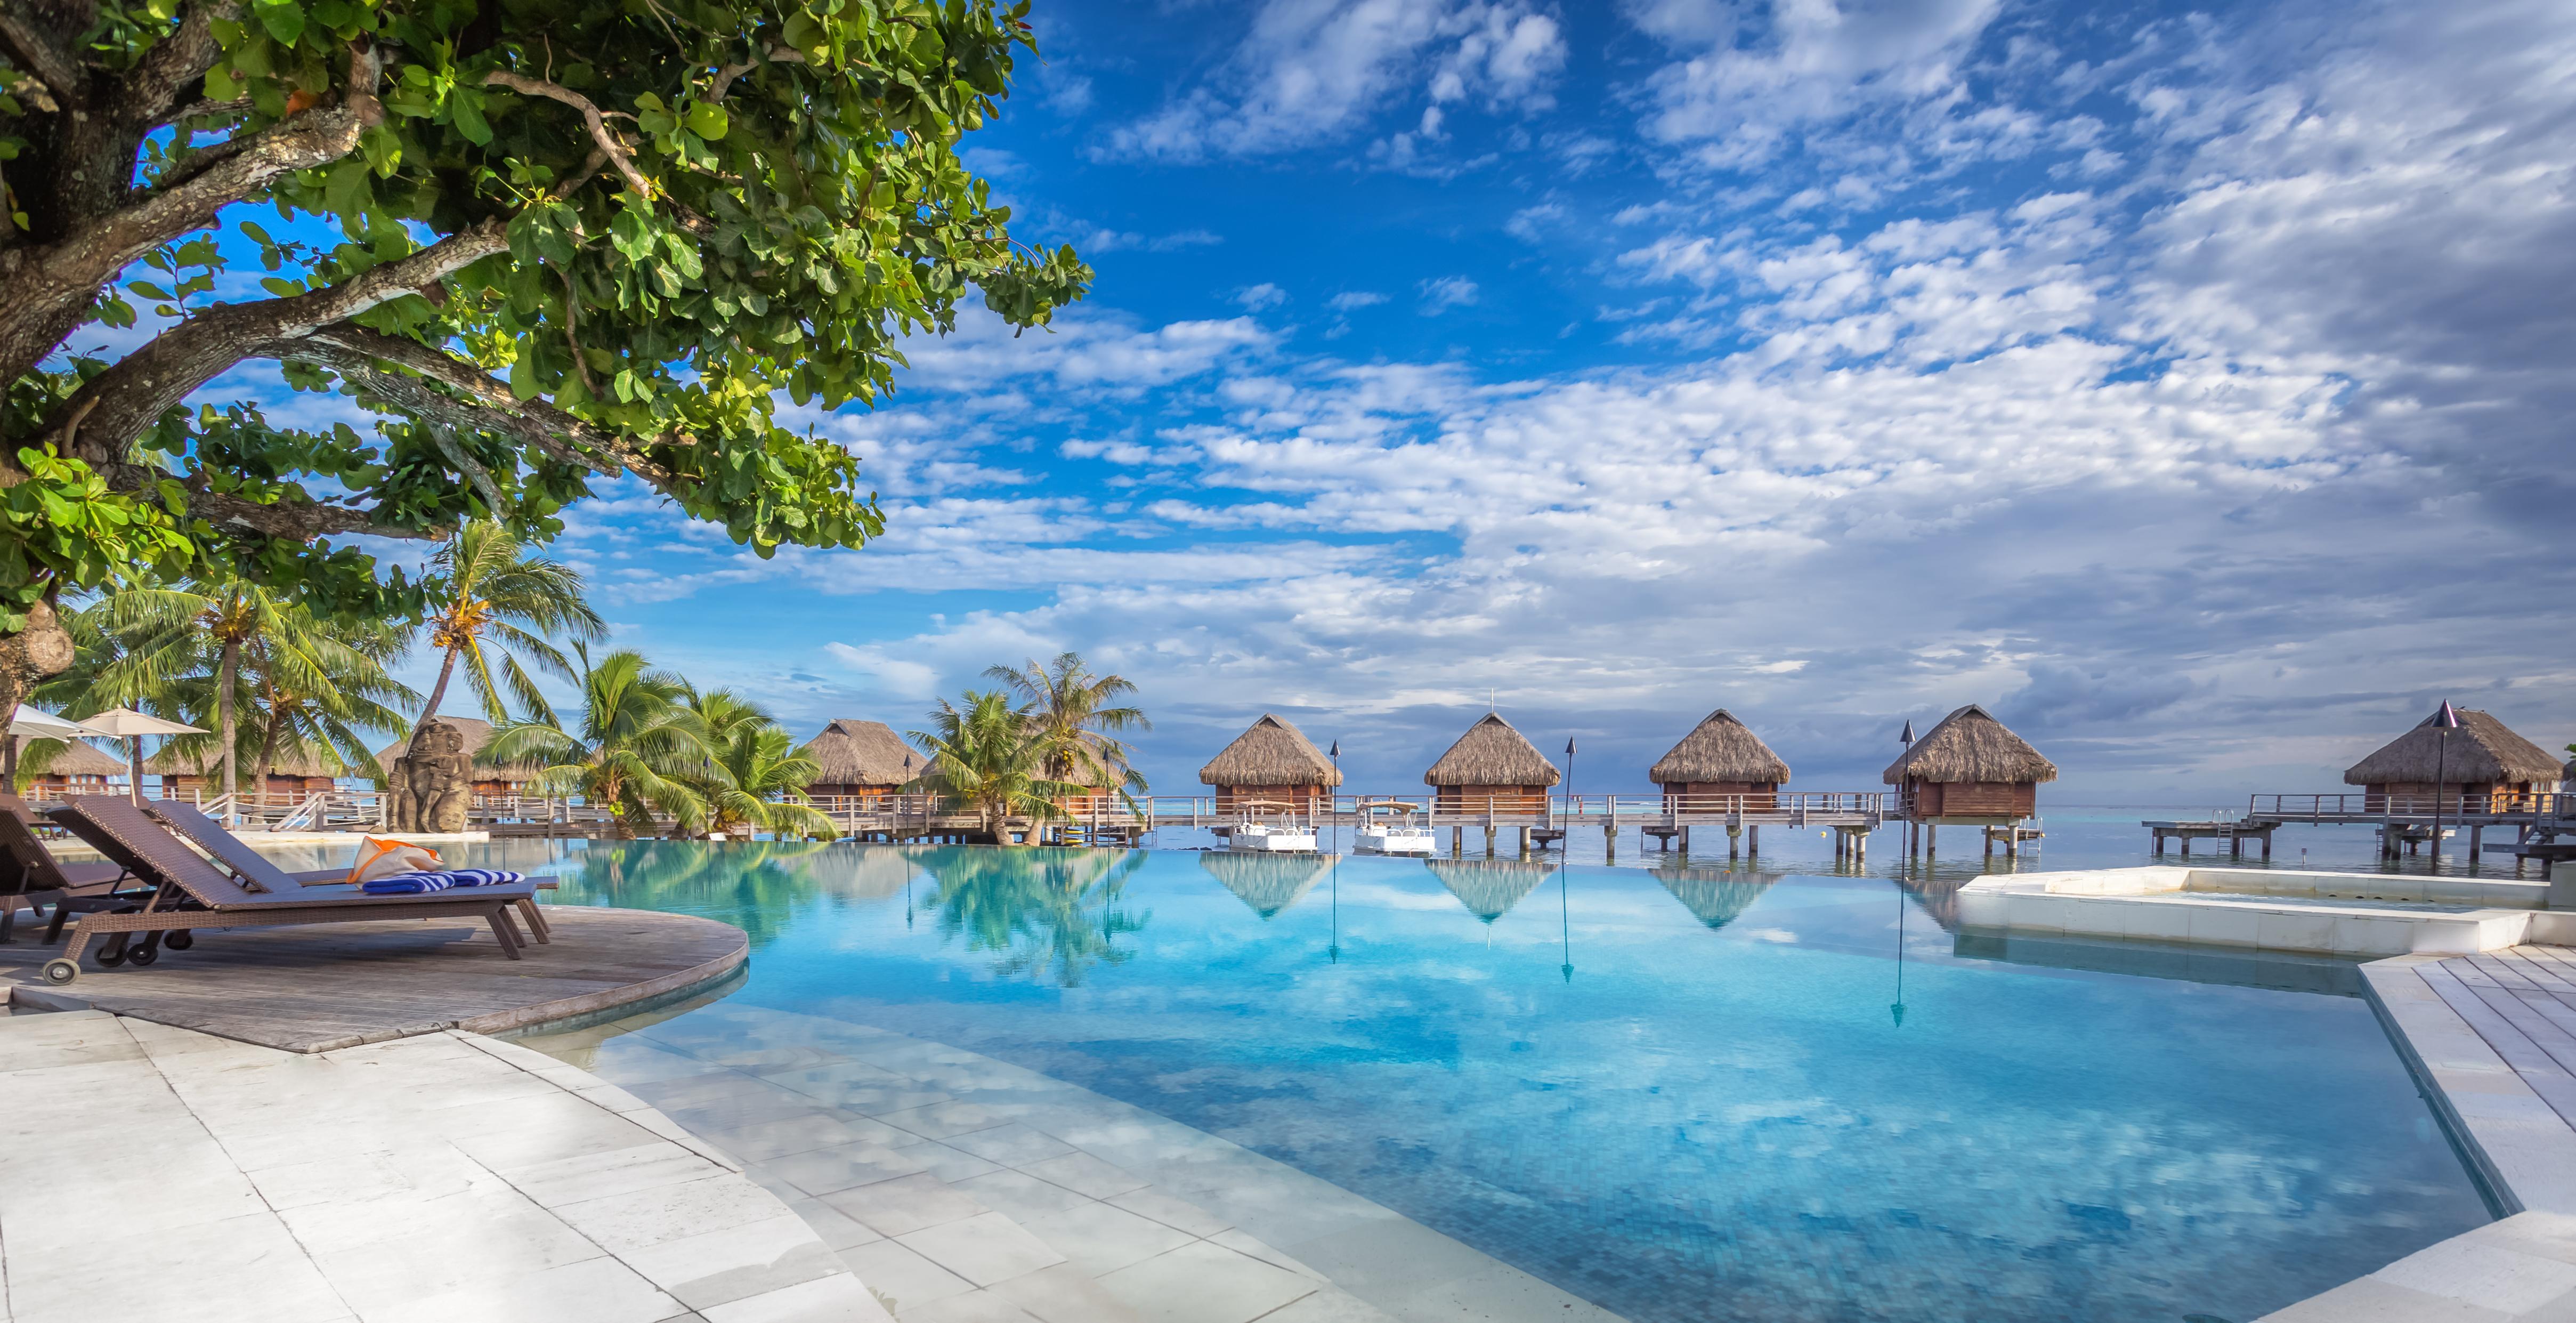 https://tahititourisme.com.br/wp-content/uploads/2017/08/HEBERGEMENT-Manava-Beach-Resort-and-Spa-Moorea-1-Charles_Veronese.jpg